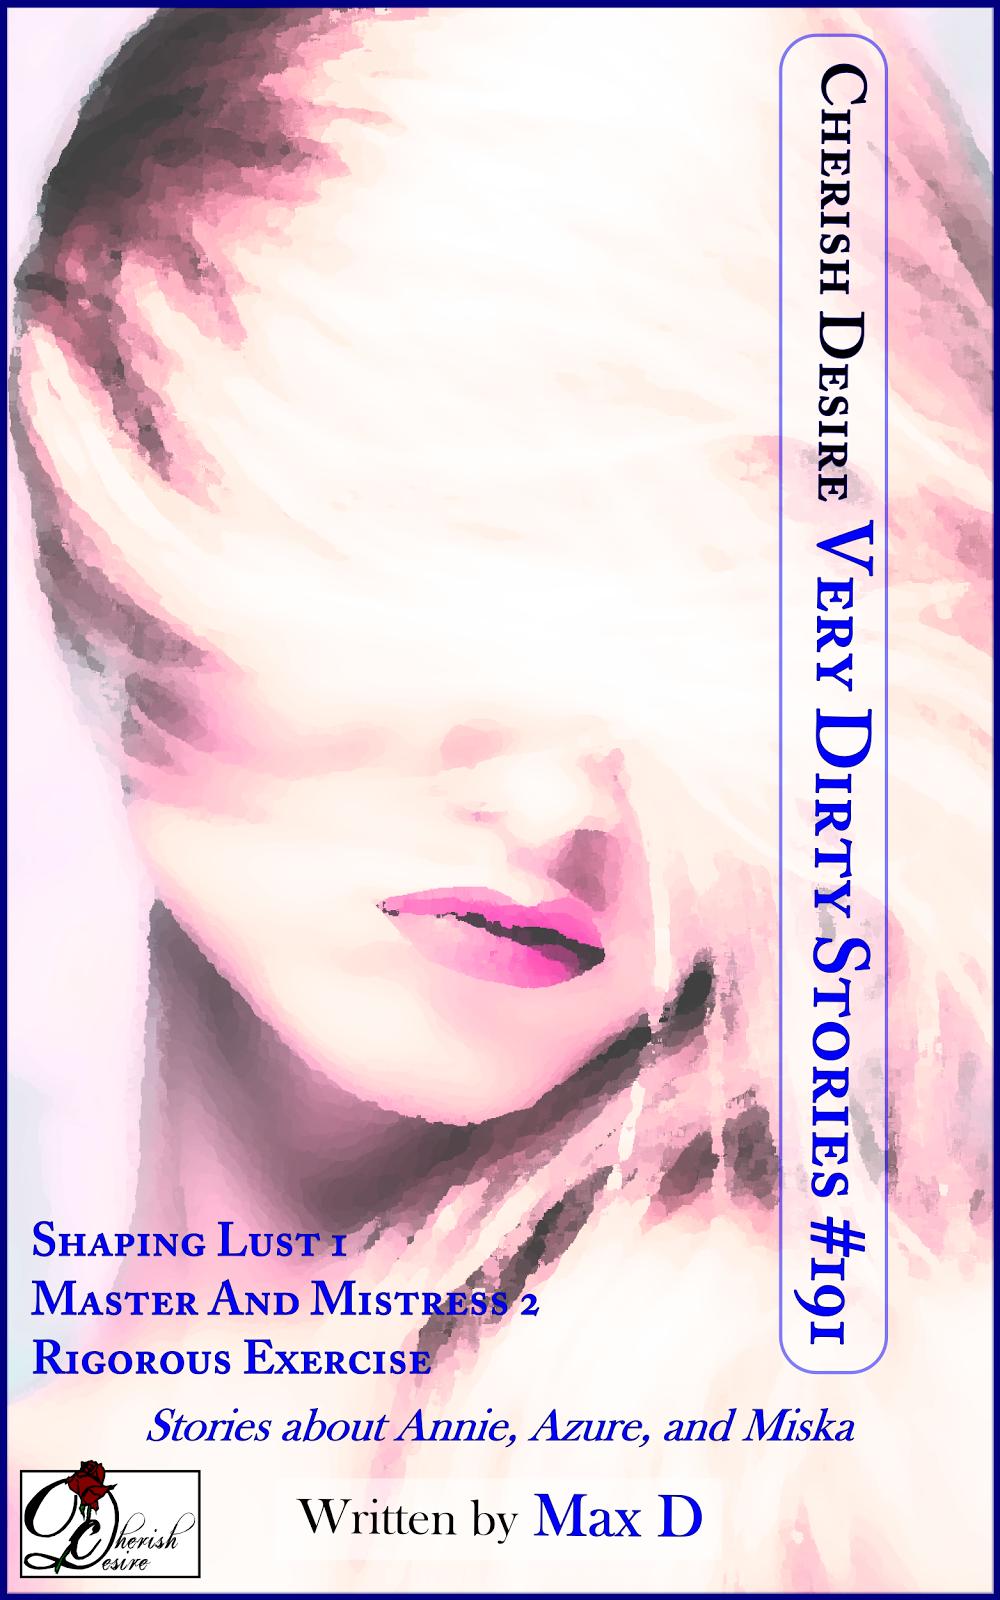 Cherish Desire: Very Dirty Stories #191, Max D, erotica